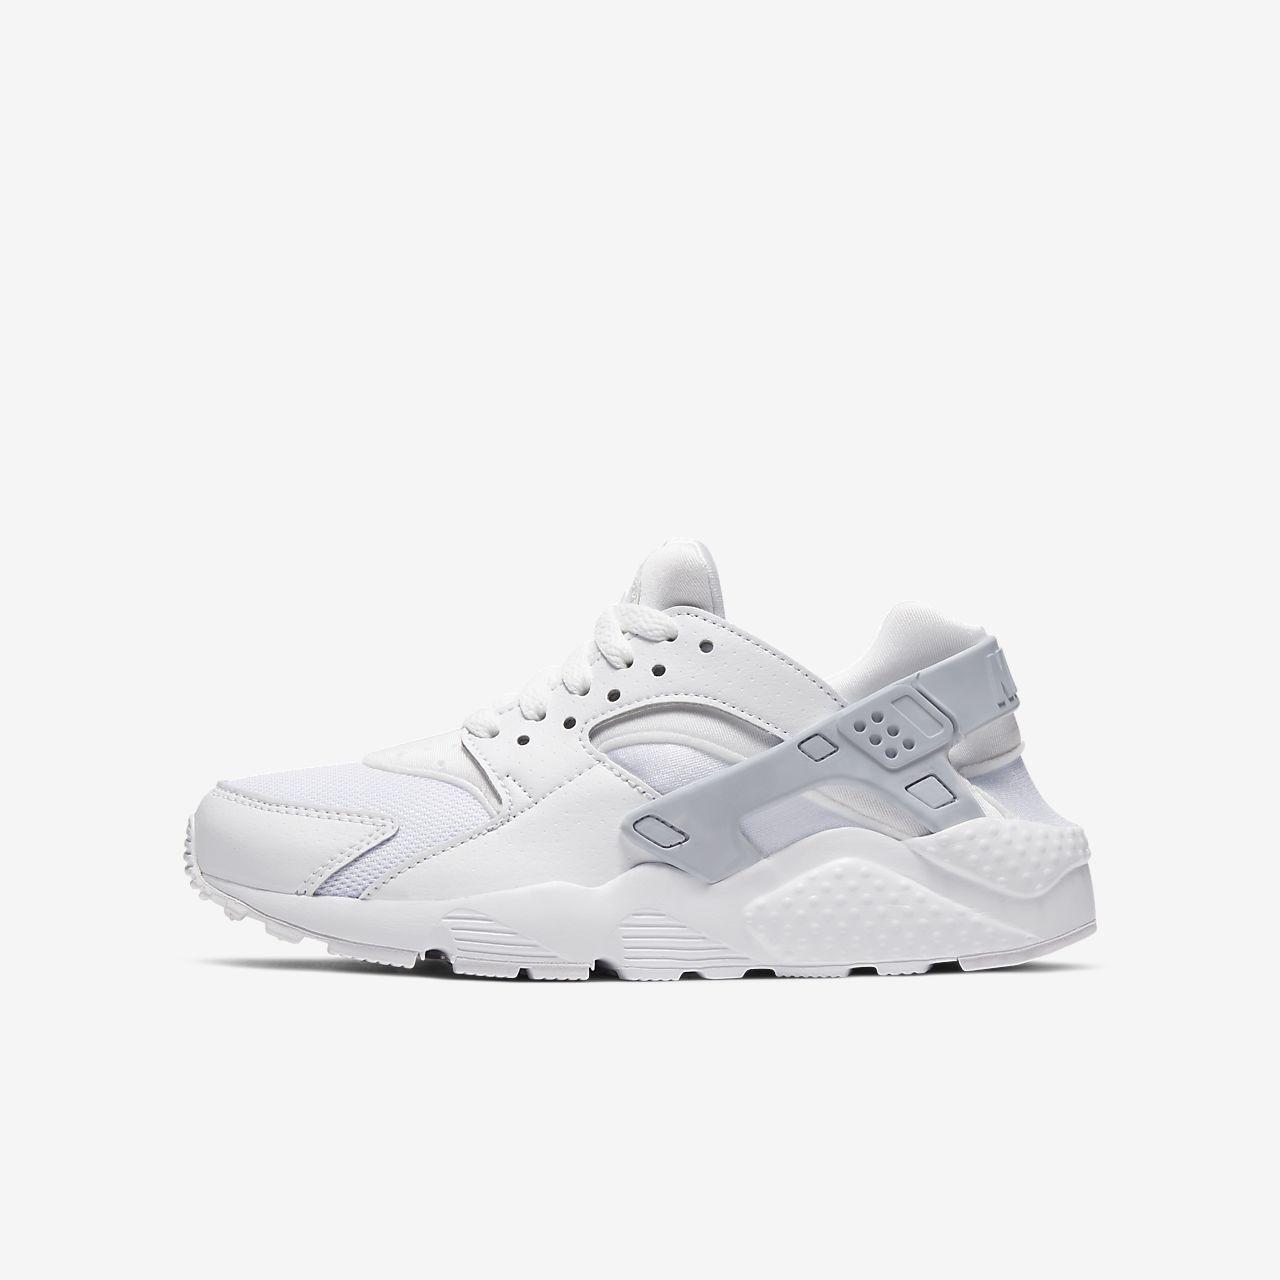 new products 32c67 57dd7 Nike Huarache Kinderschoen